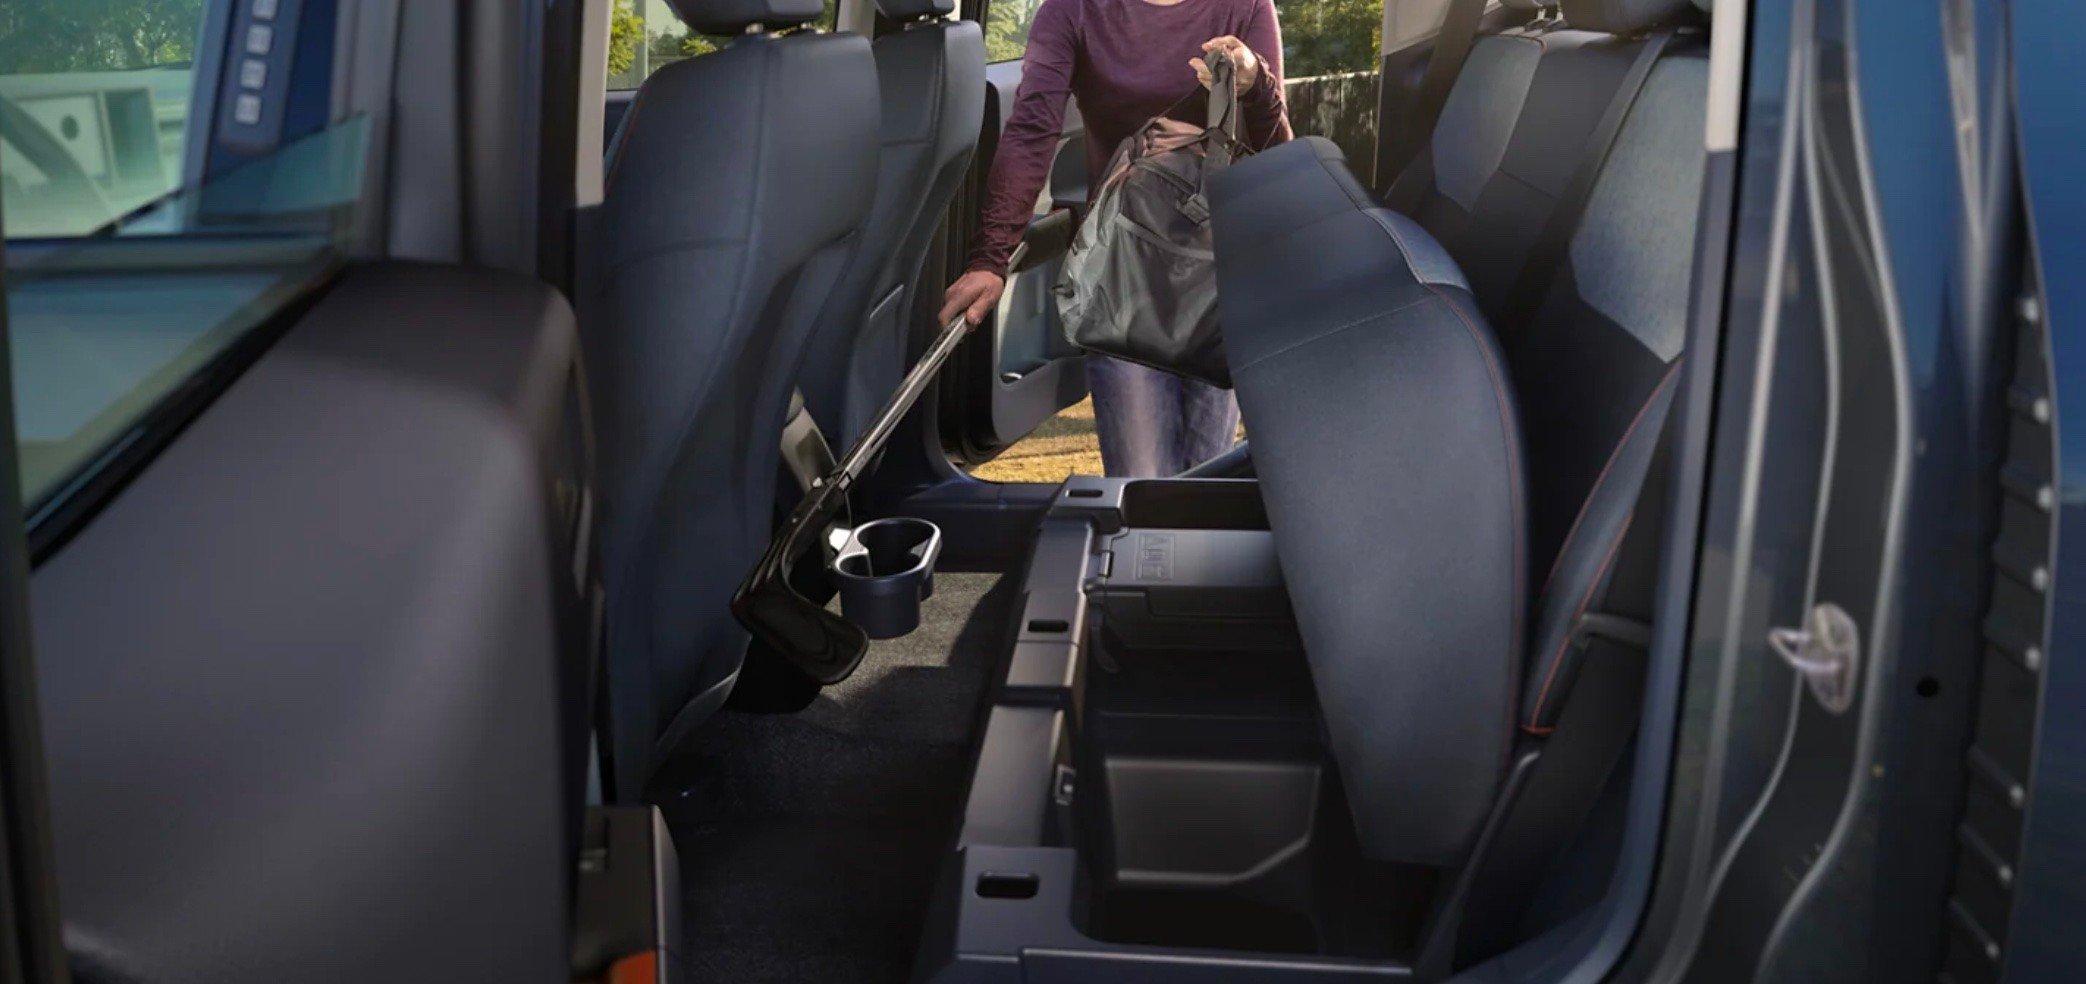 Standard under-backseat storage in the Ford Maverick